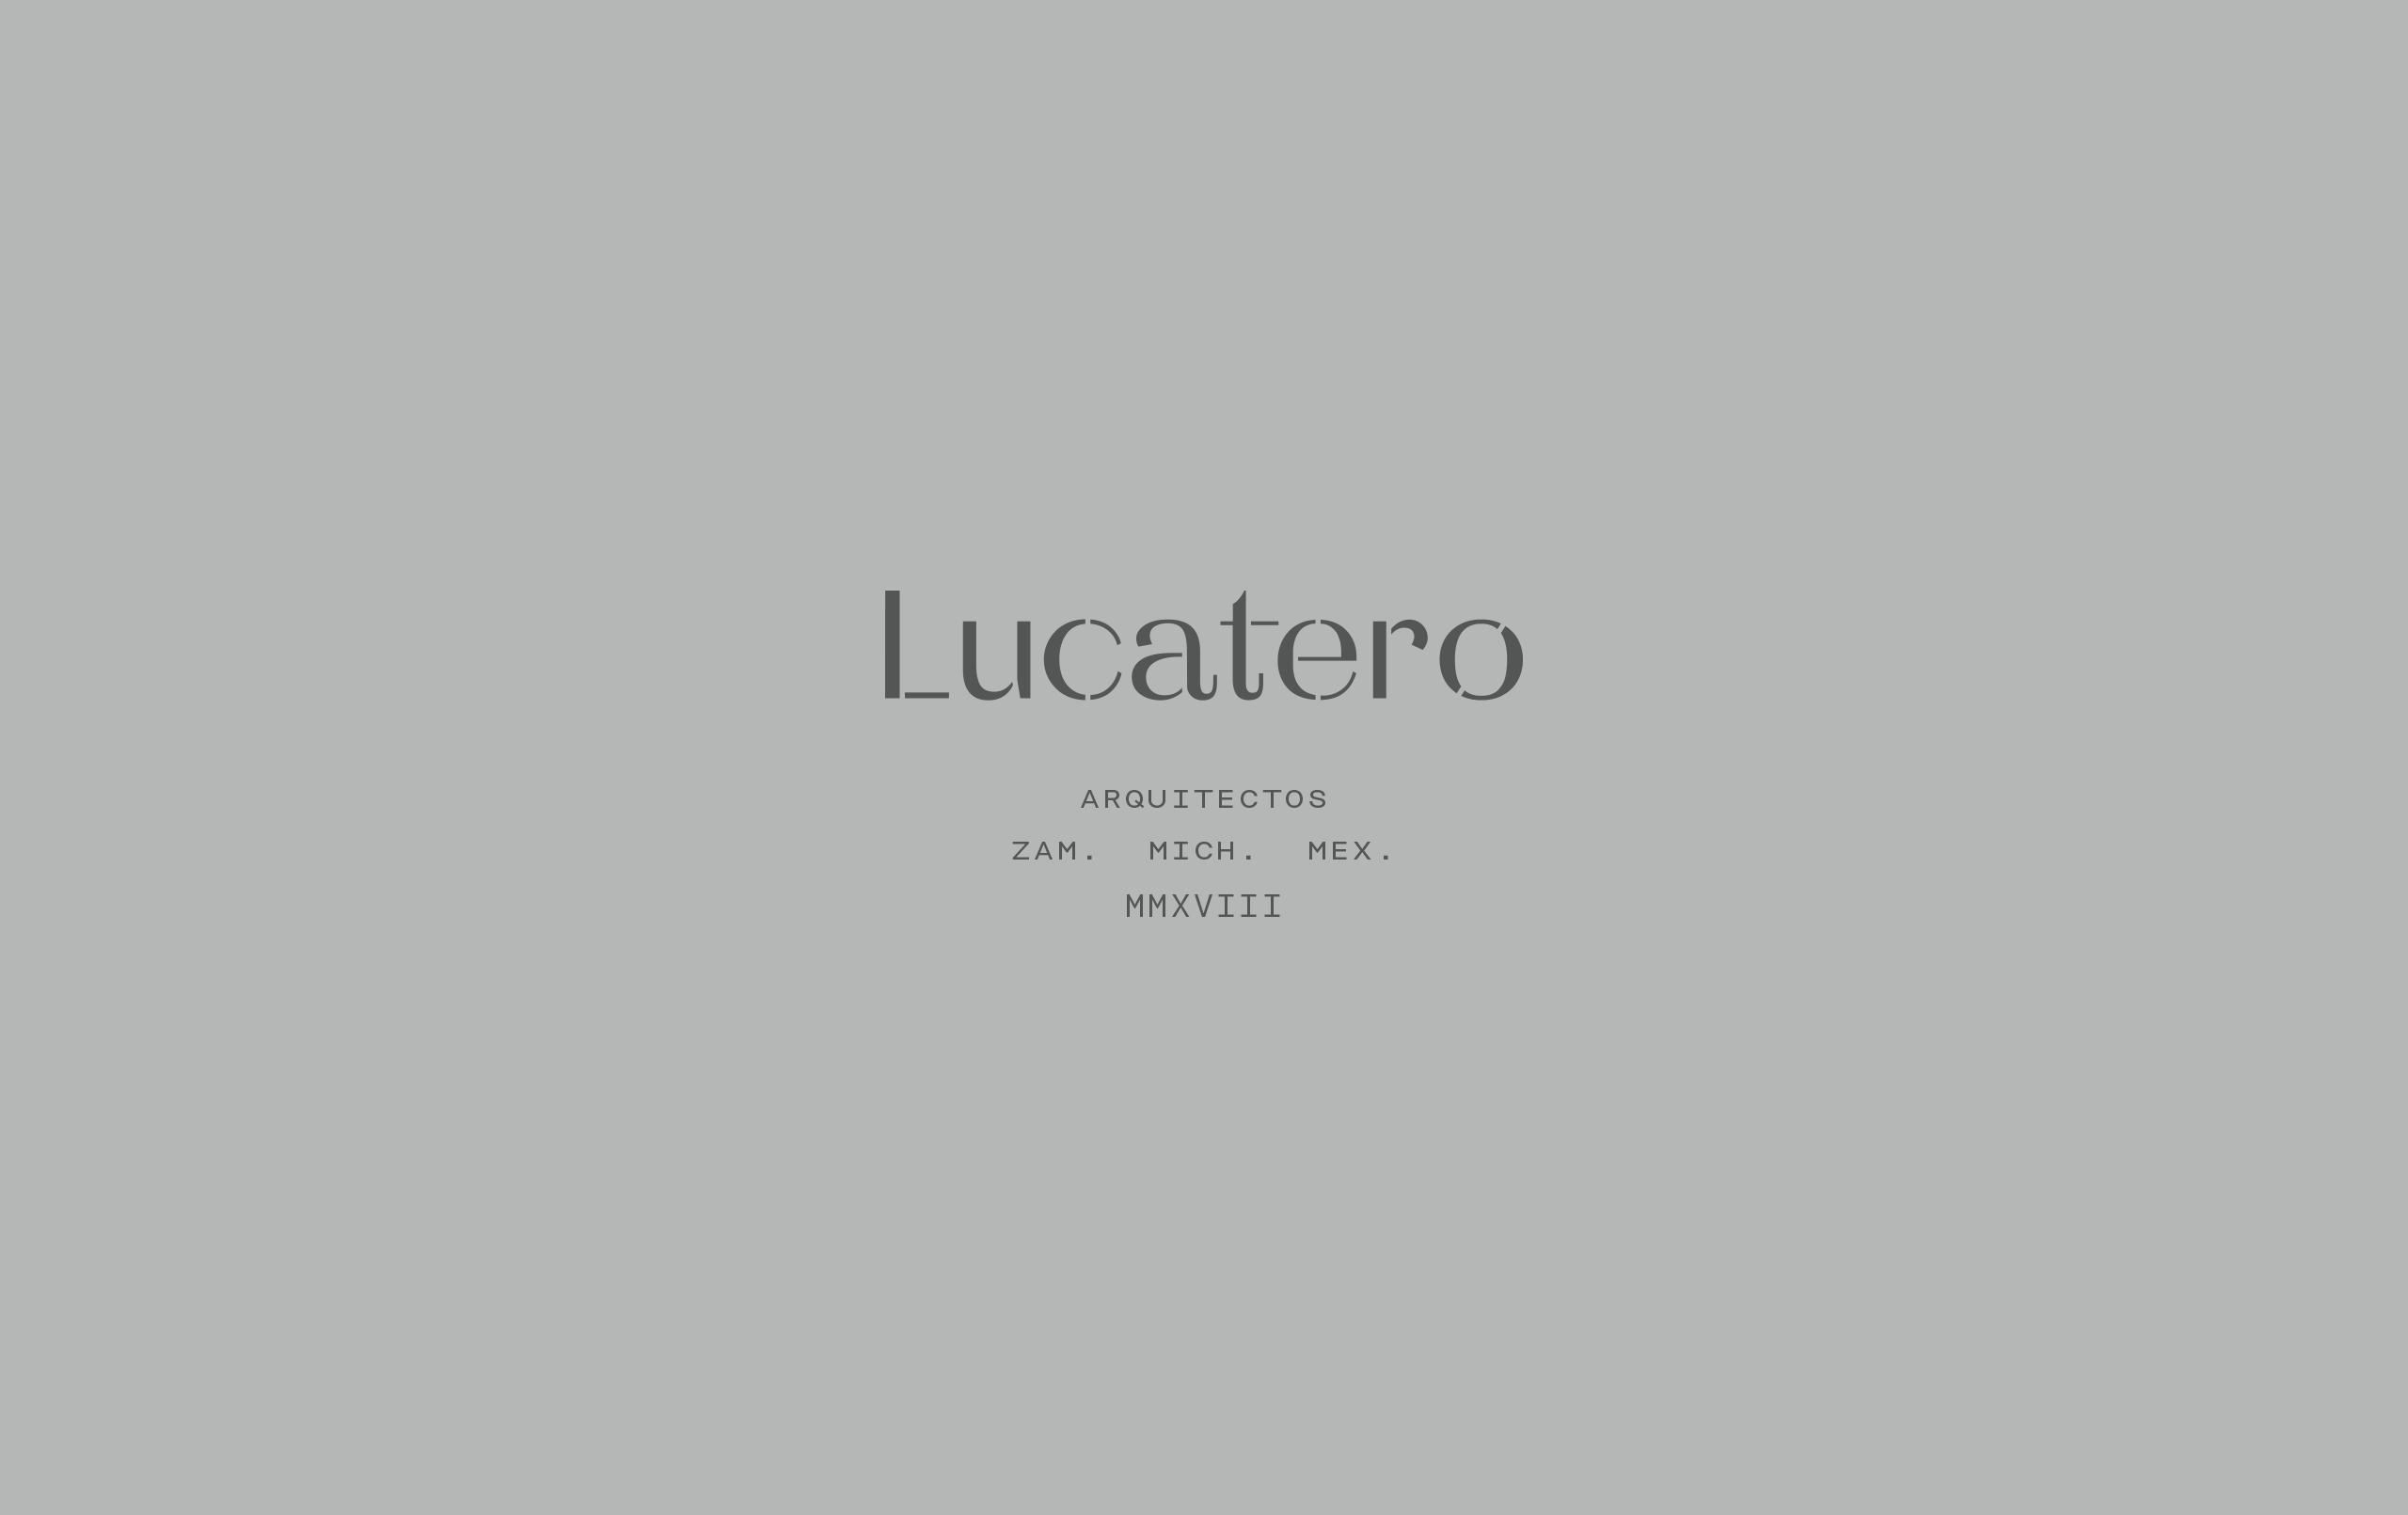 Brand Identity for Lucatero Architecture Studio by Treceveinte